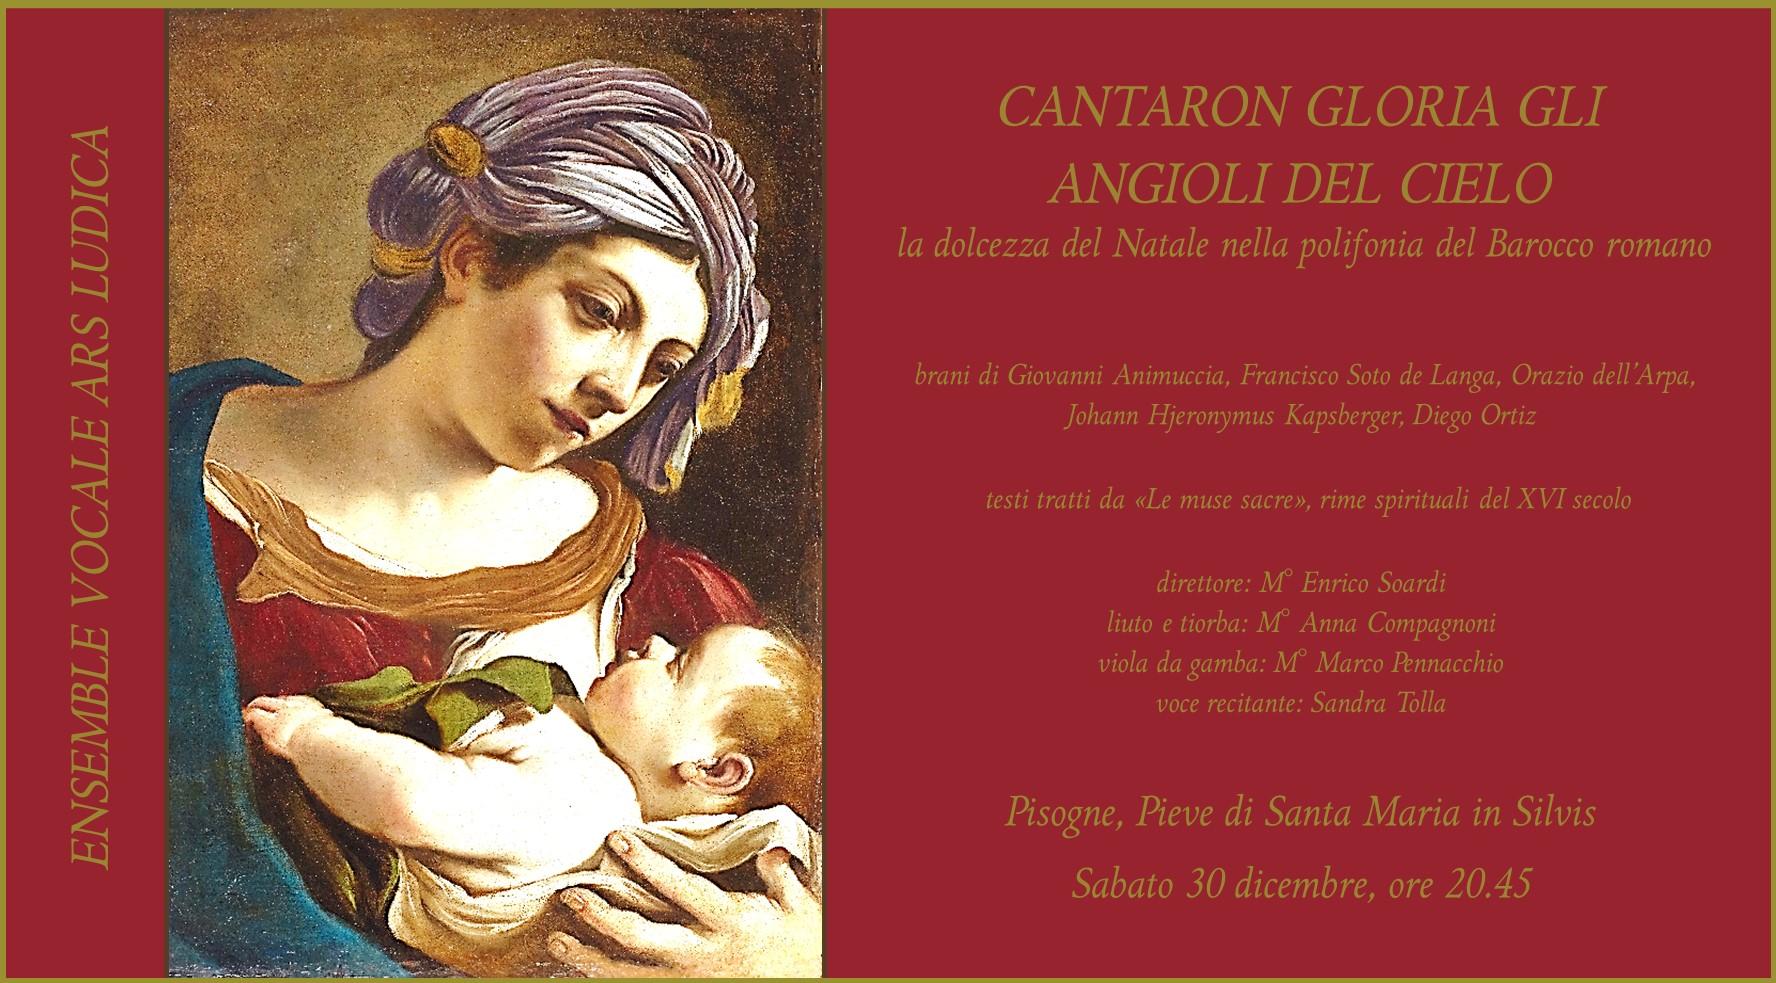 CANTARON GLORIA GL'ANGIOLI DEL CIELO